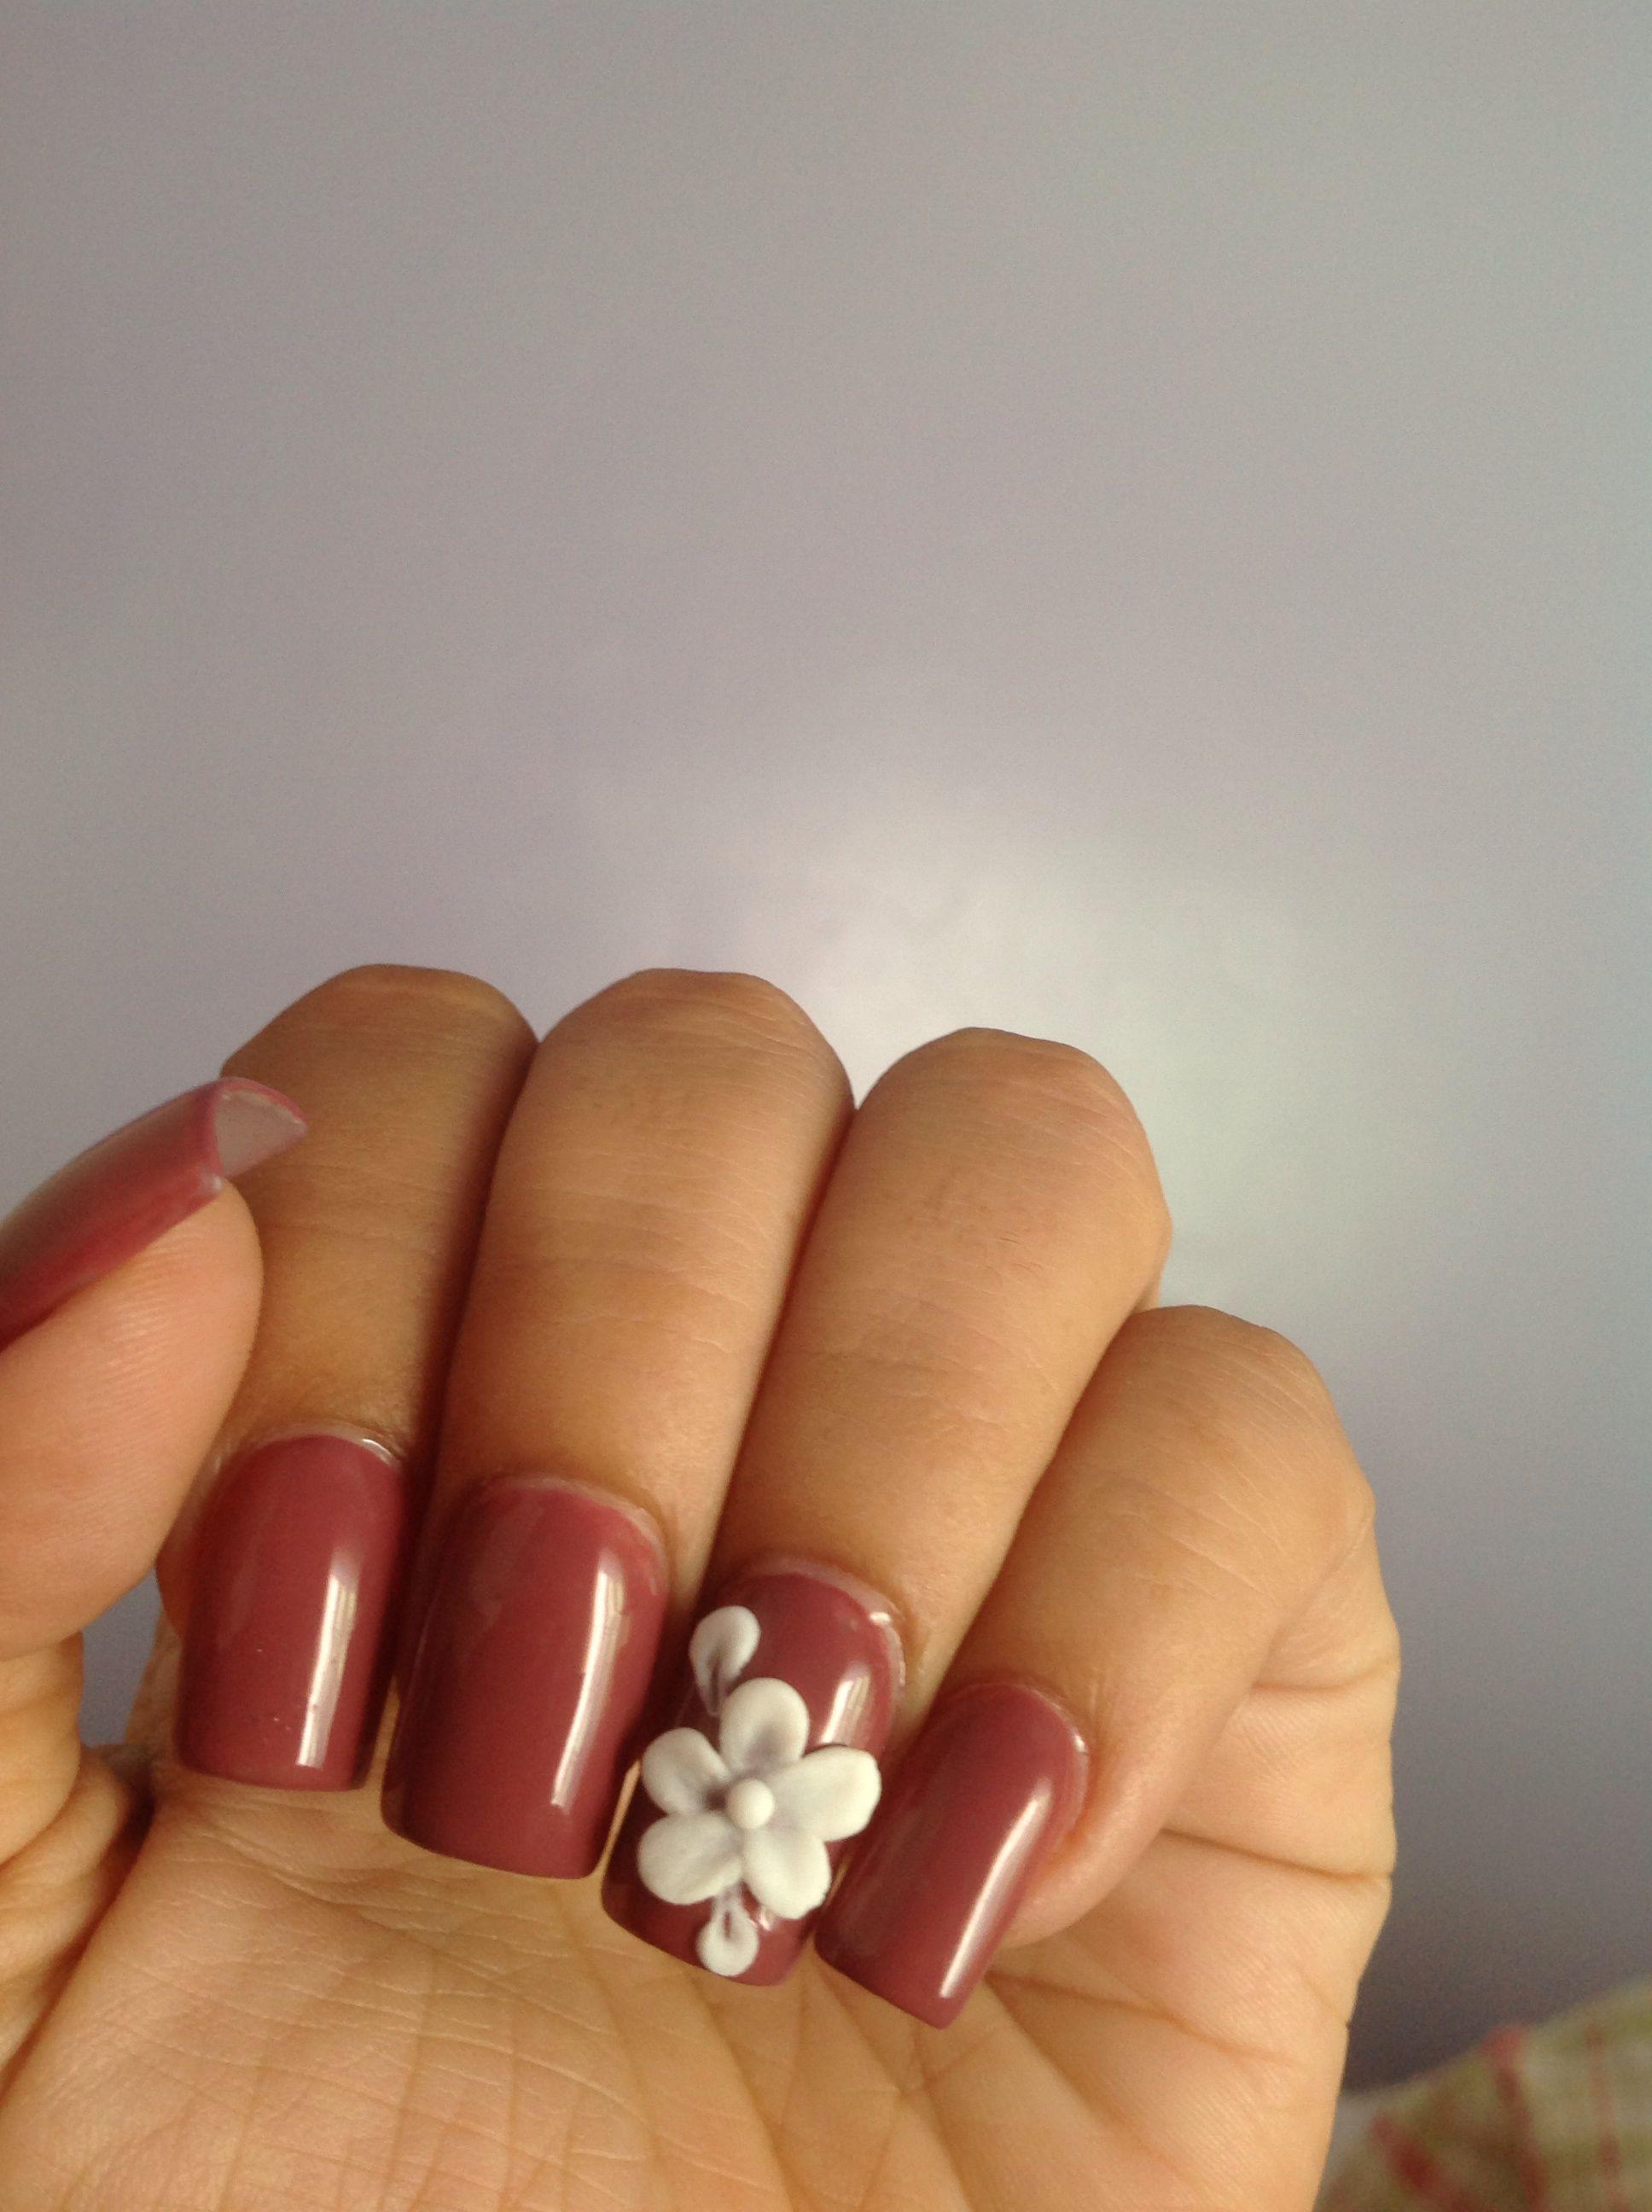 Neutral acrylic nails with 3D design   Nails   Pinterest   3d design ...